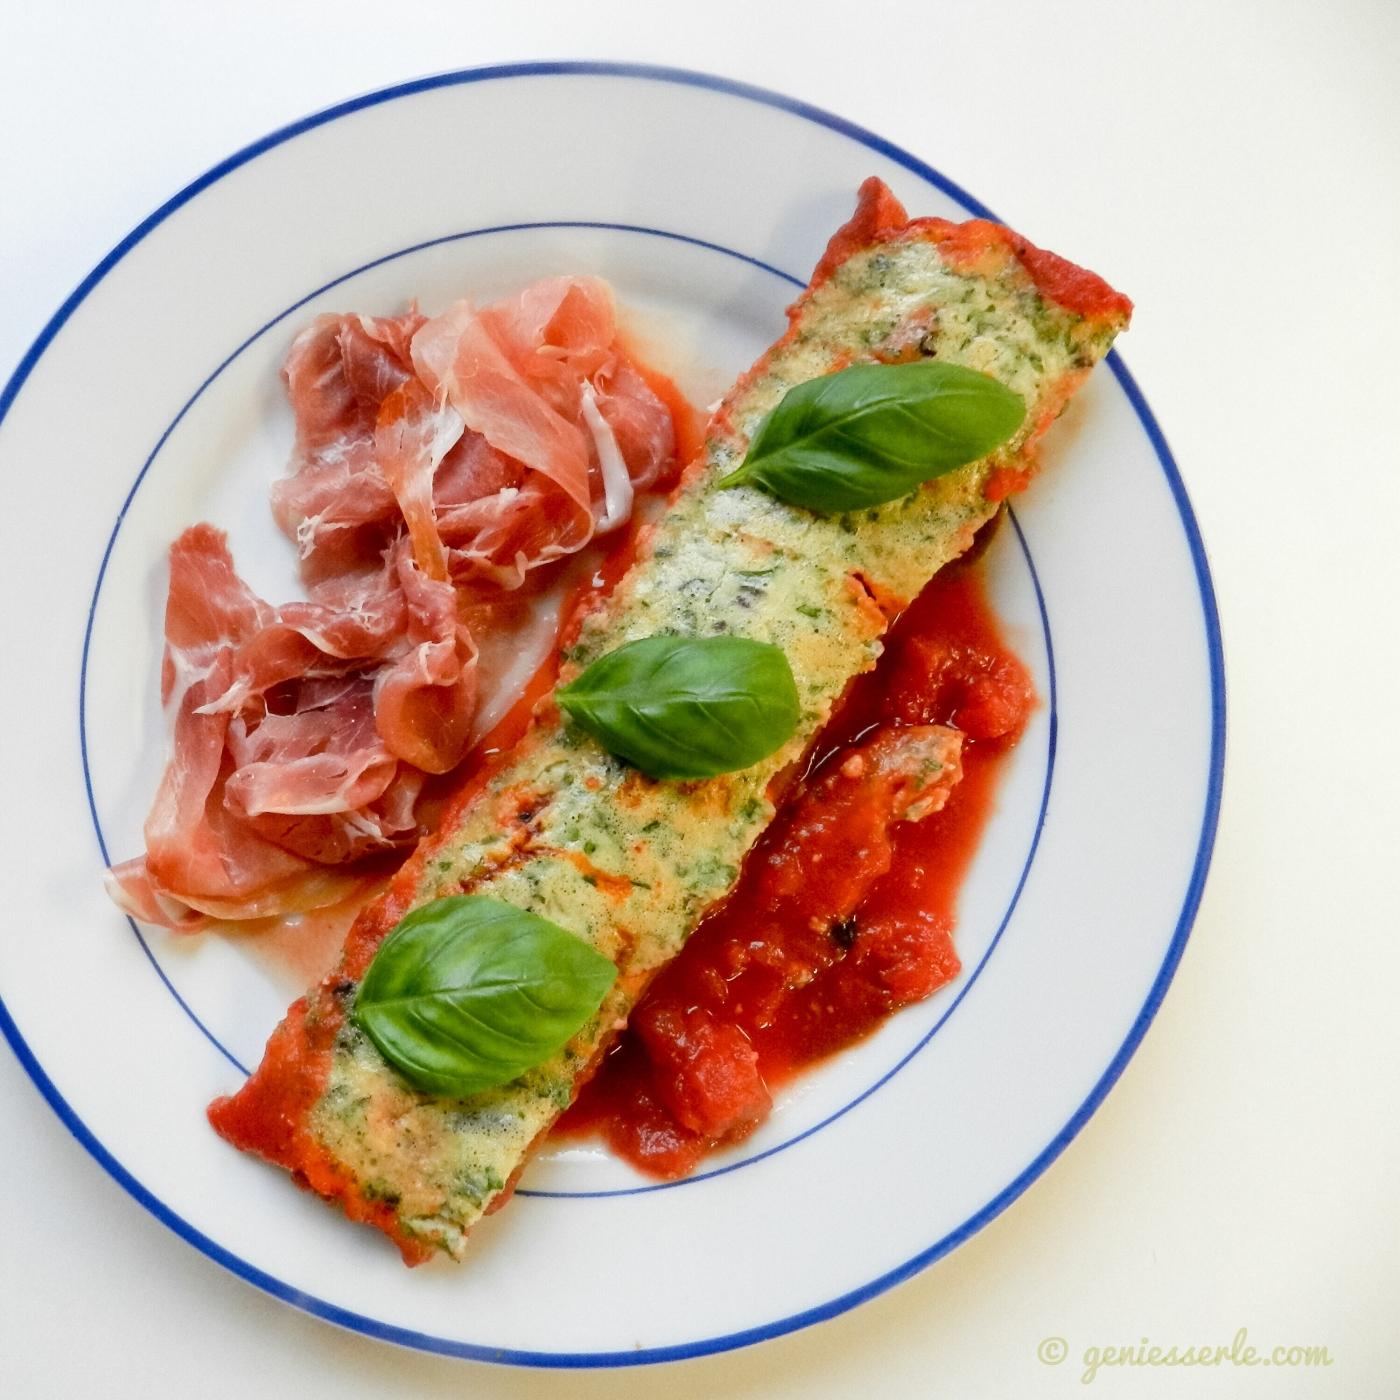 Spargel mit Parmesan-Kräuterhaube auf Tomatensugo